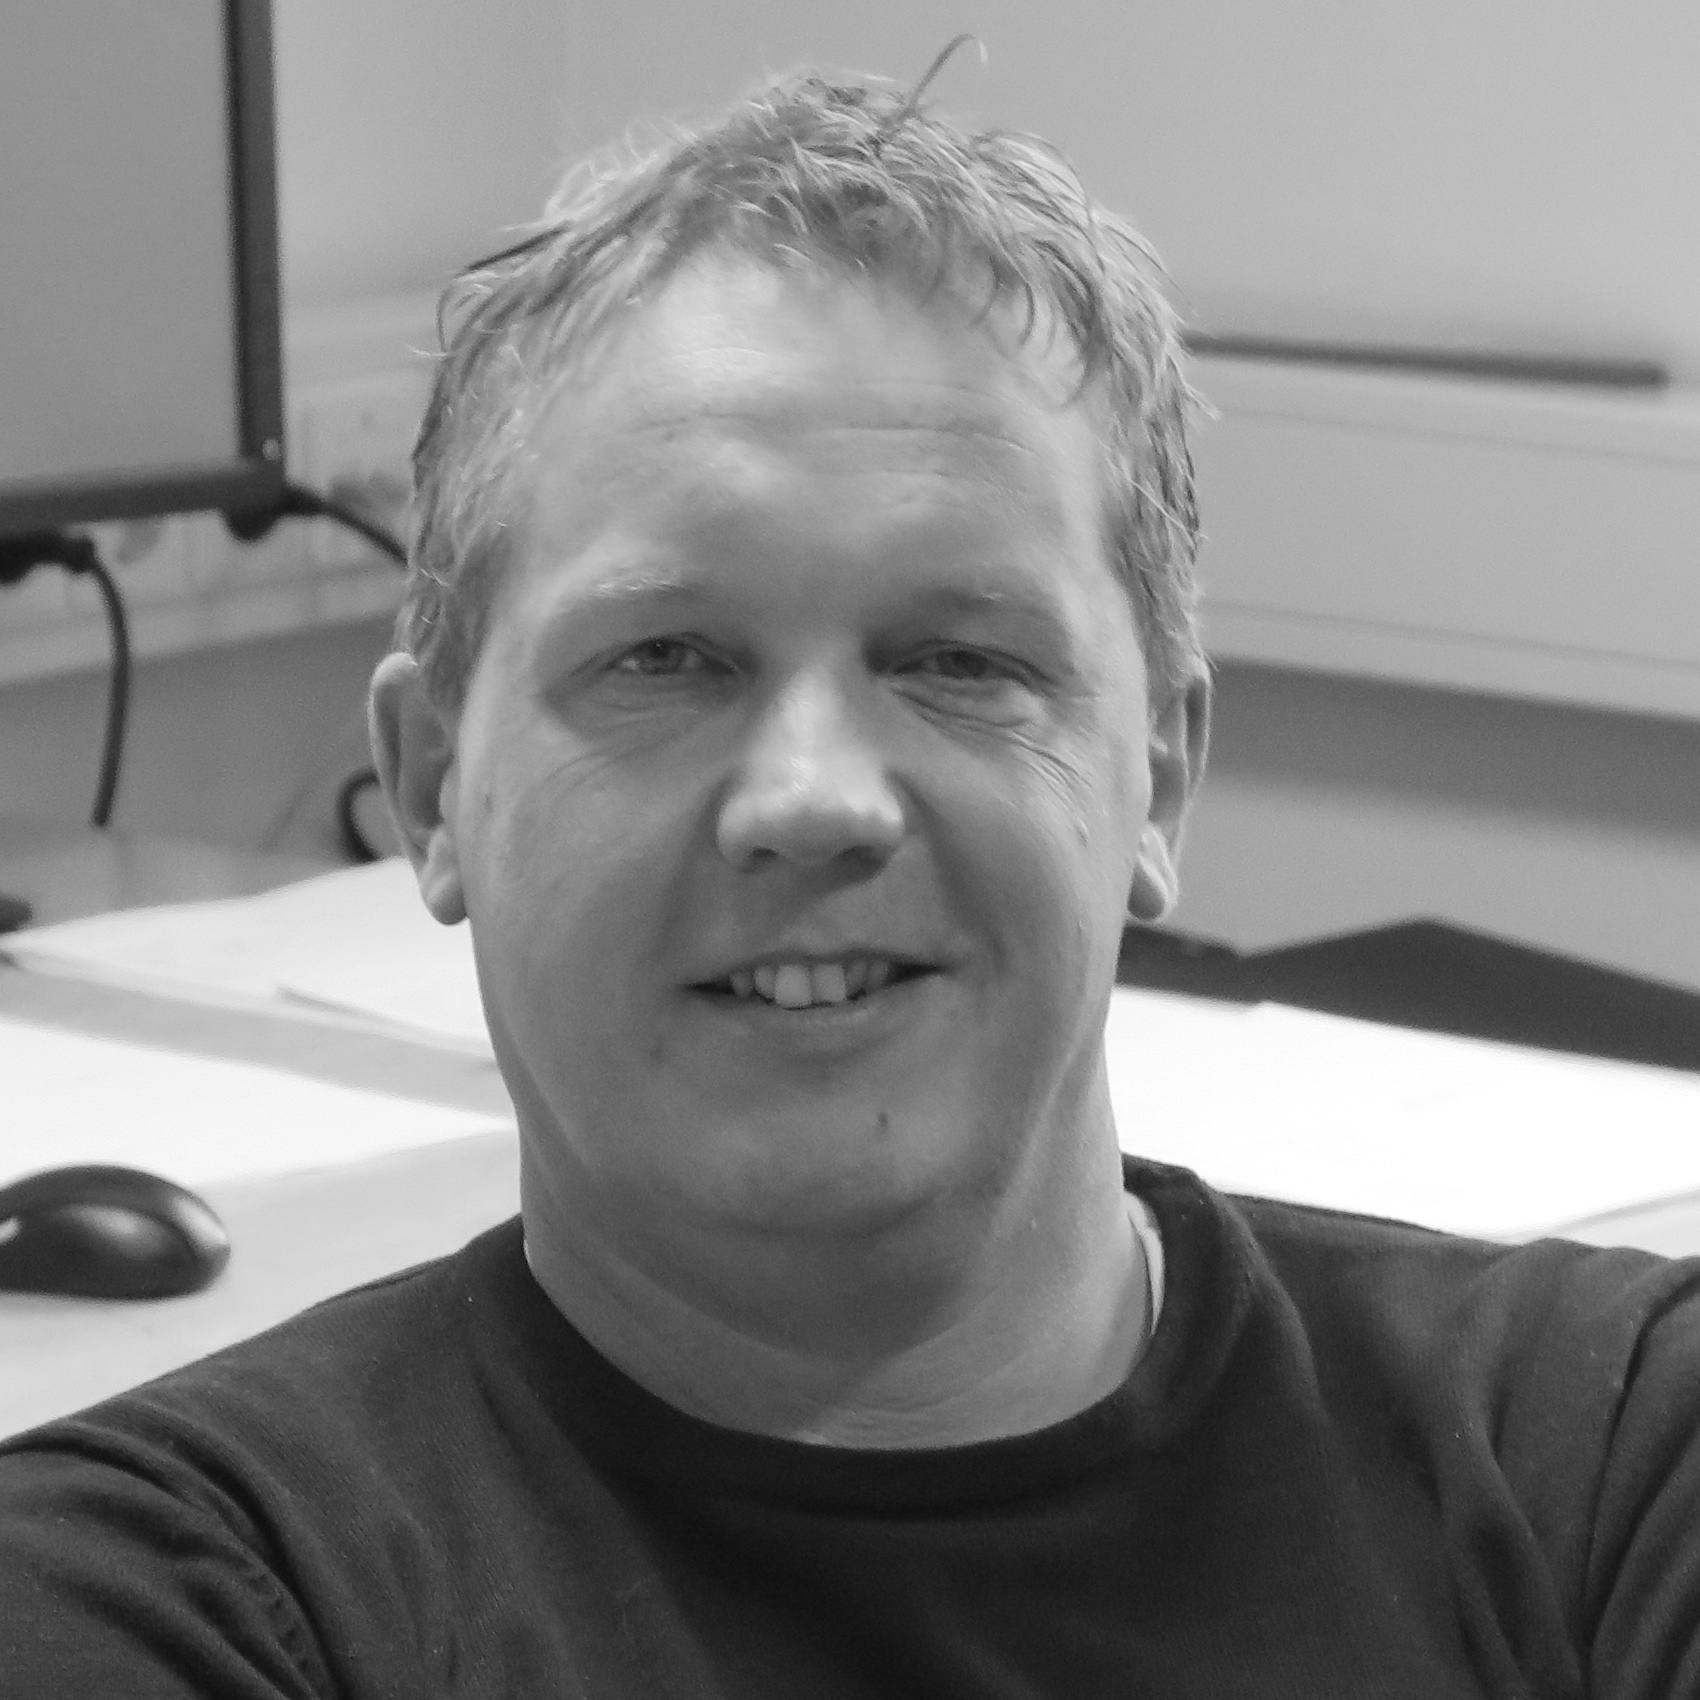 Erik Zwaagstra